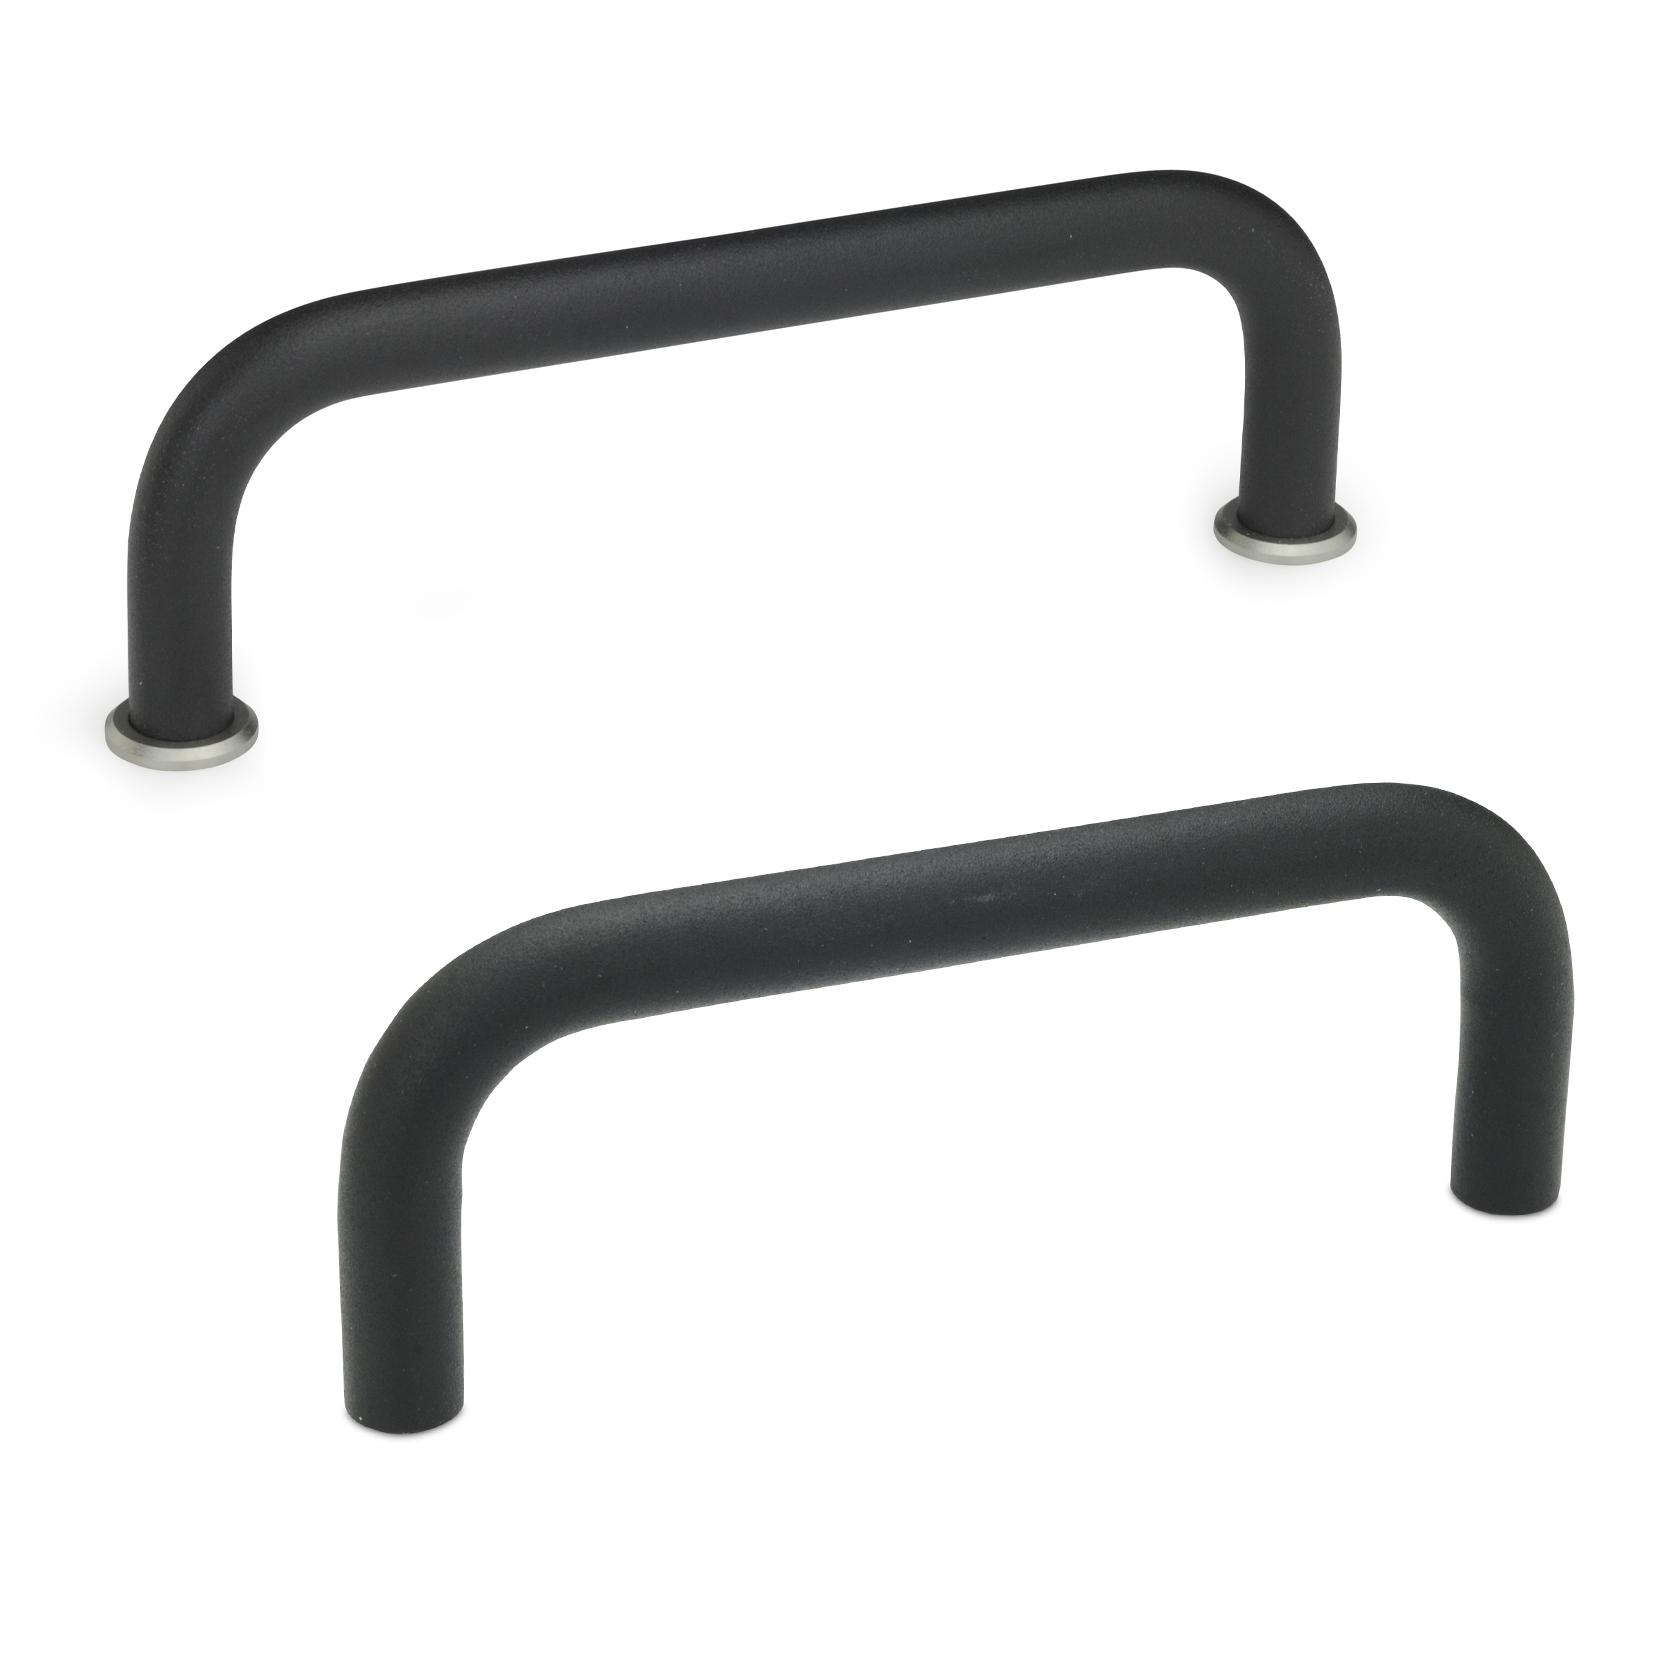 Bügelgriff 425, rund, Aluminium, schwarz